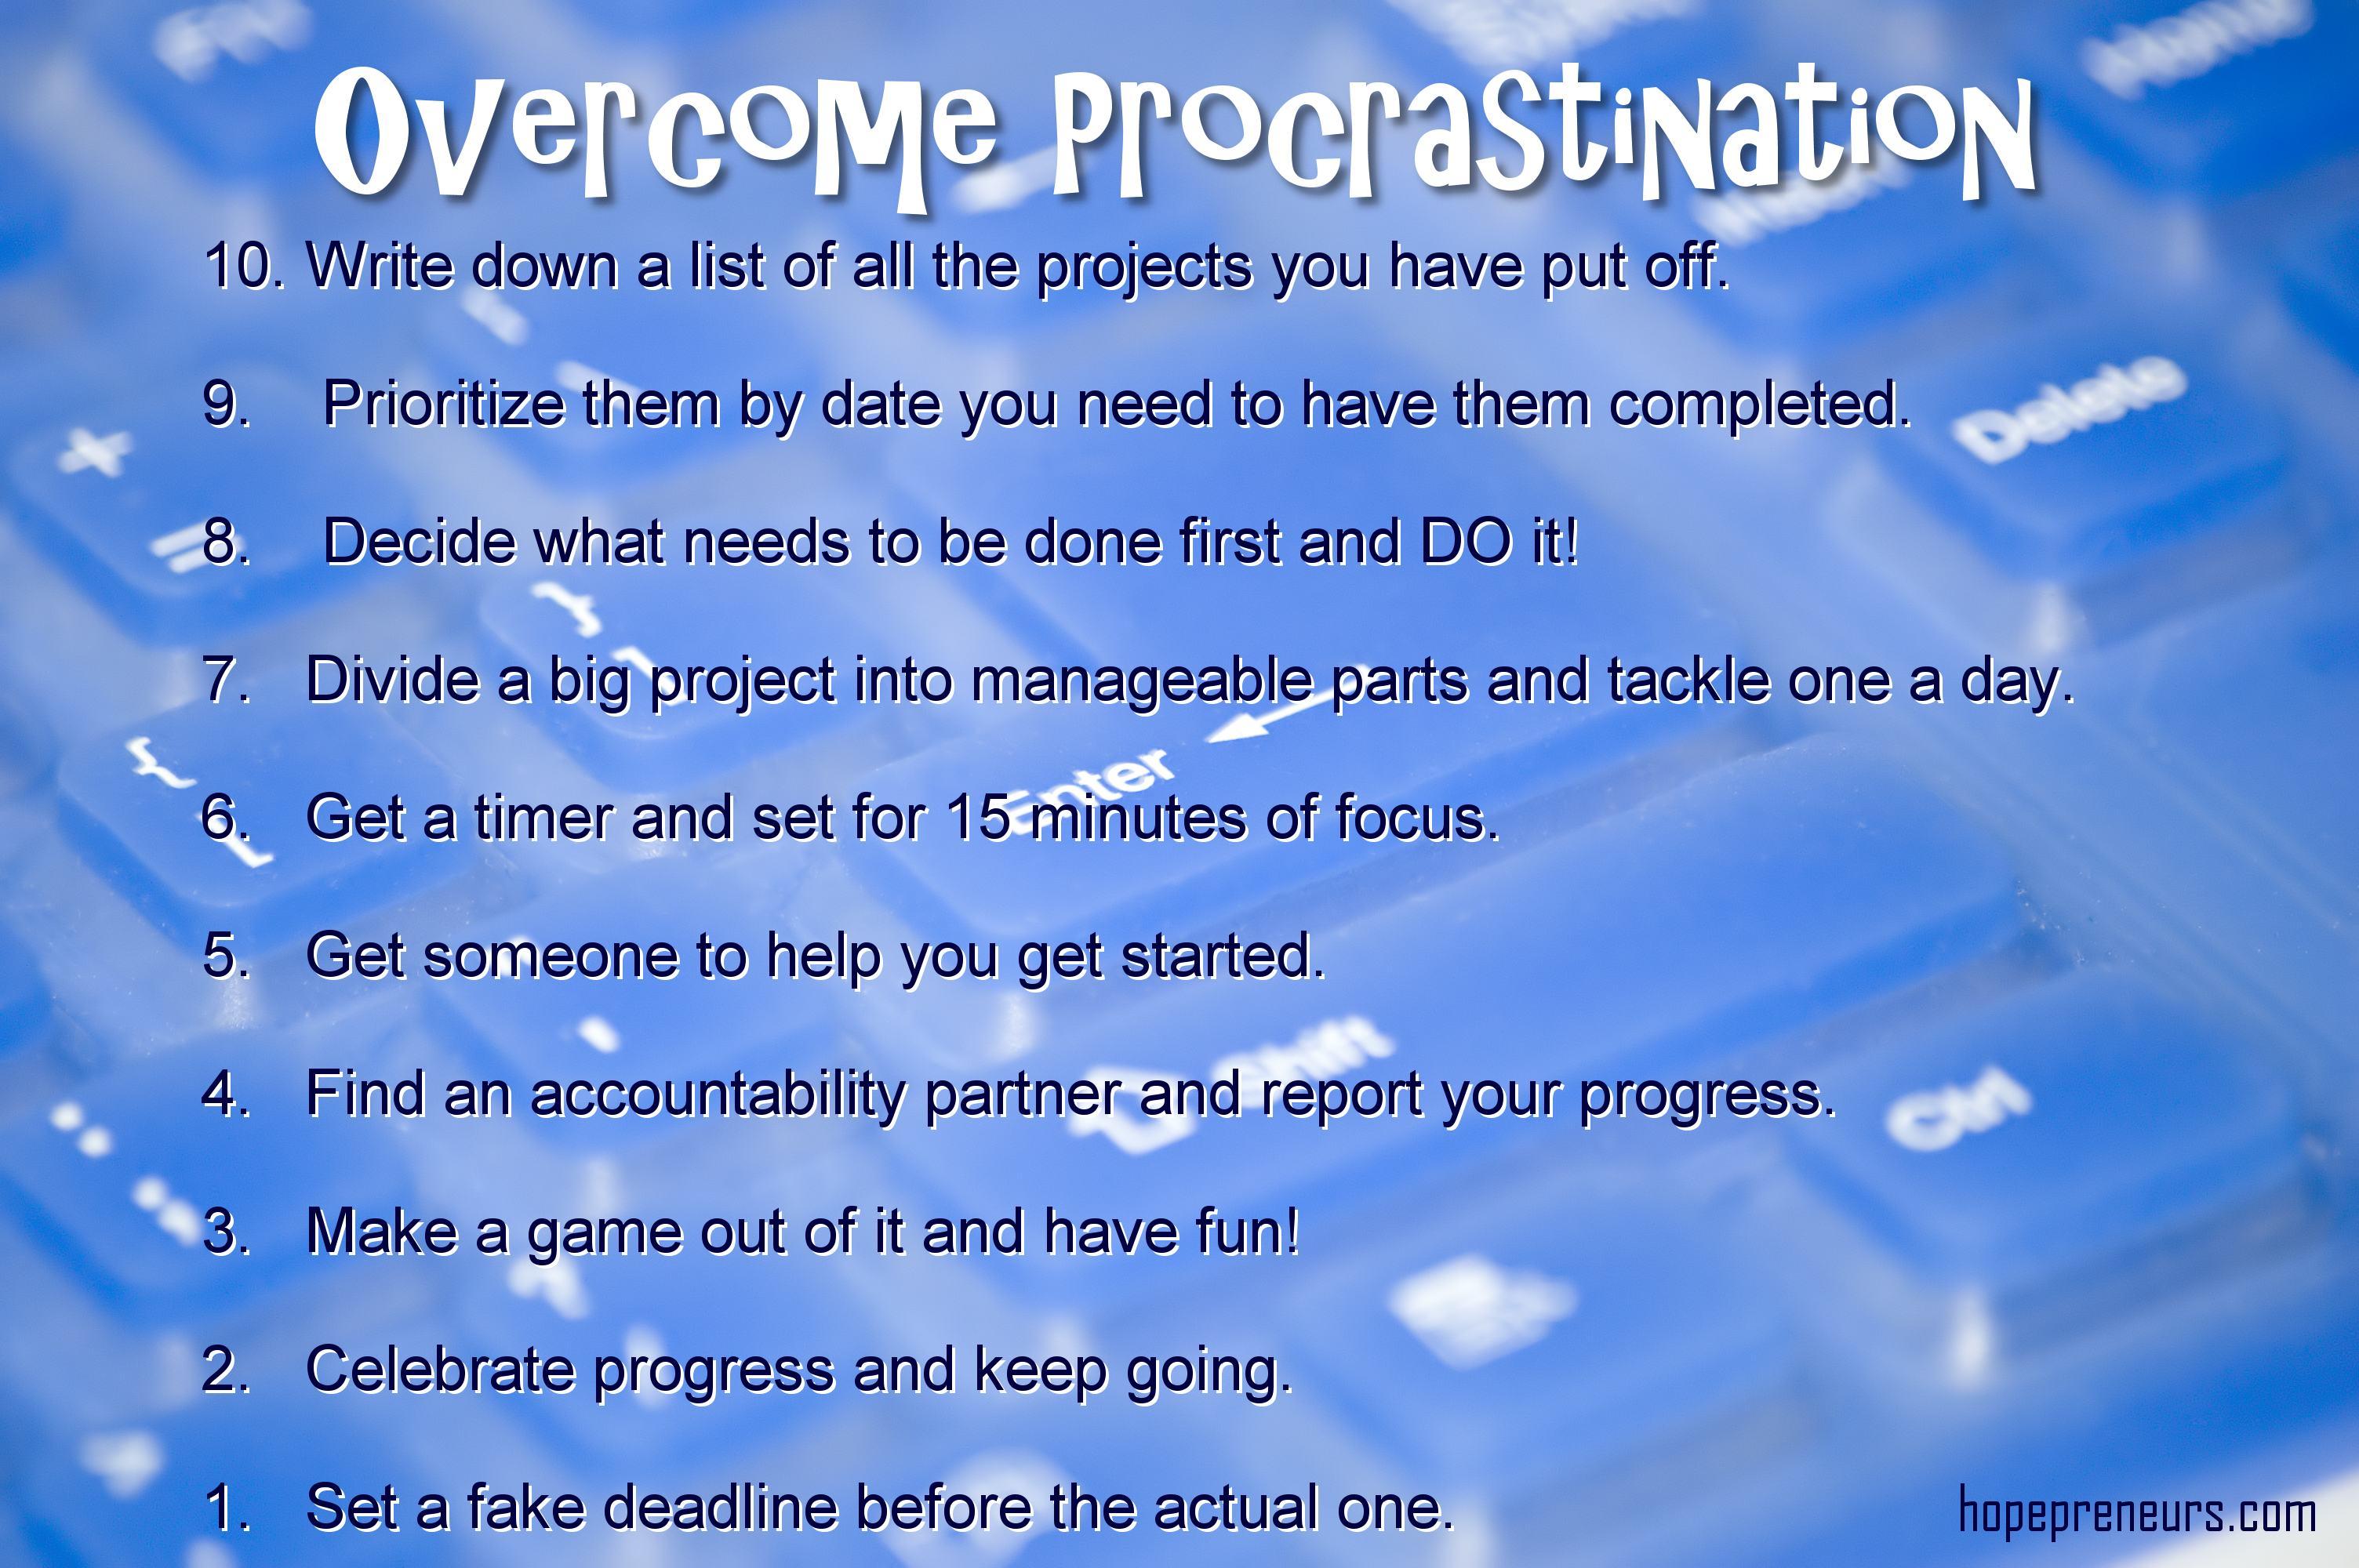 10 Tips to Overcoming Procrastination | HOPEpreneurs - Providing ...